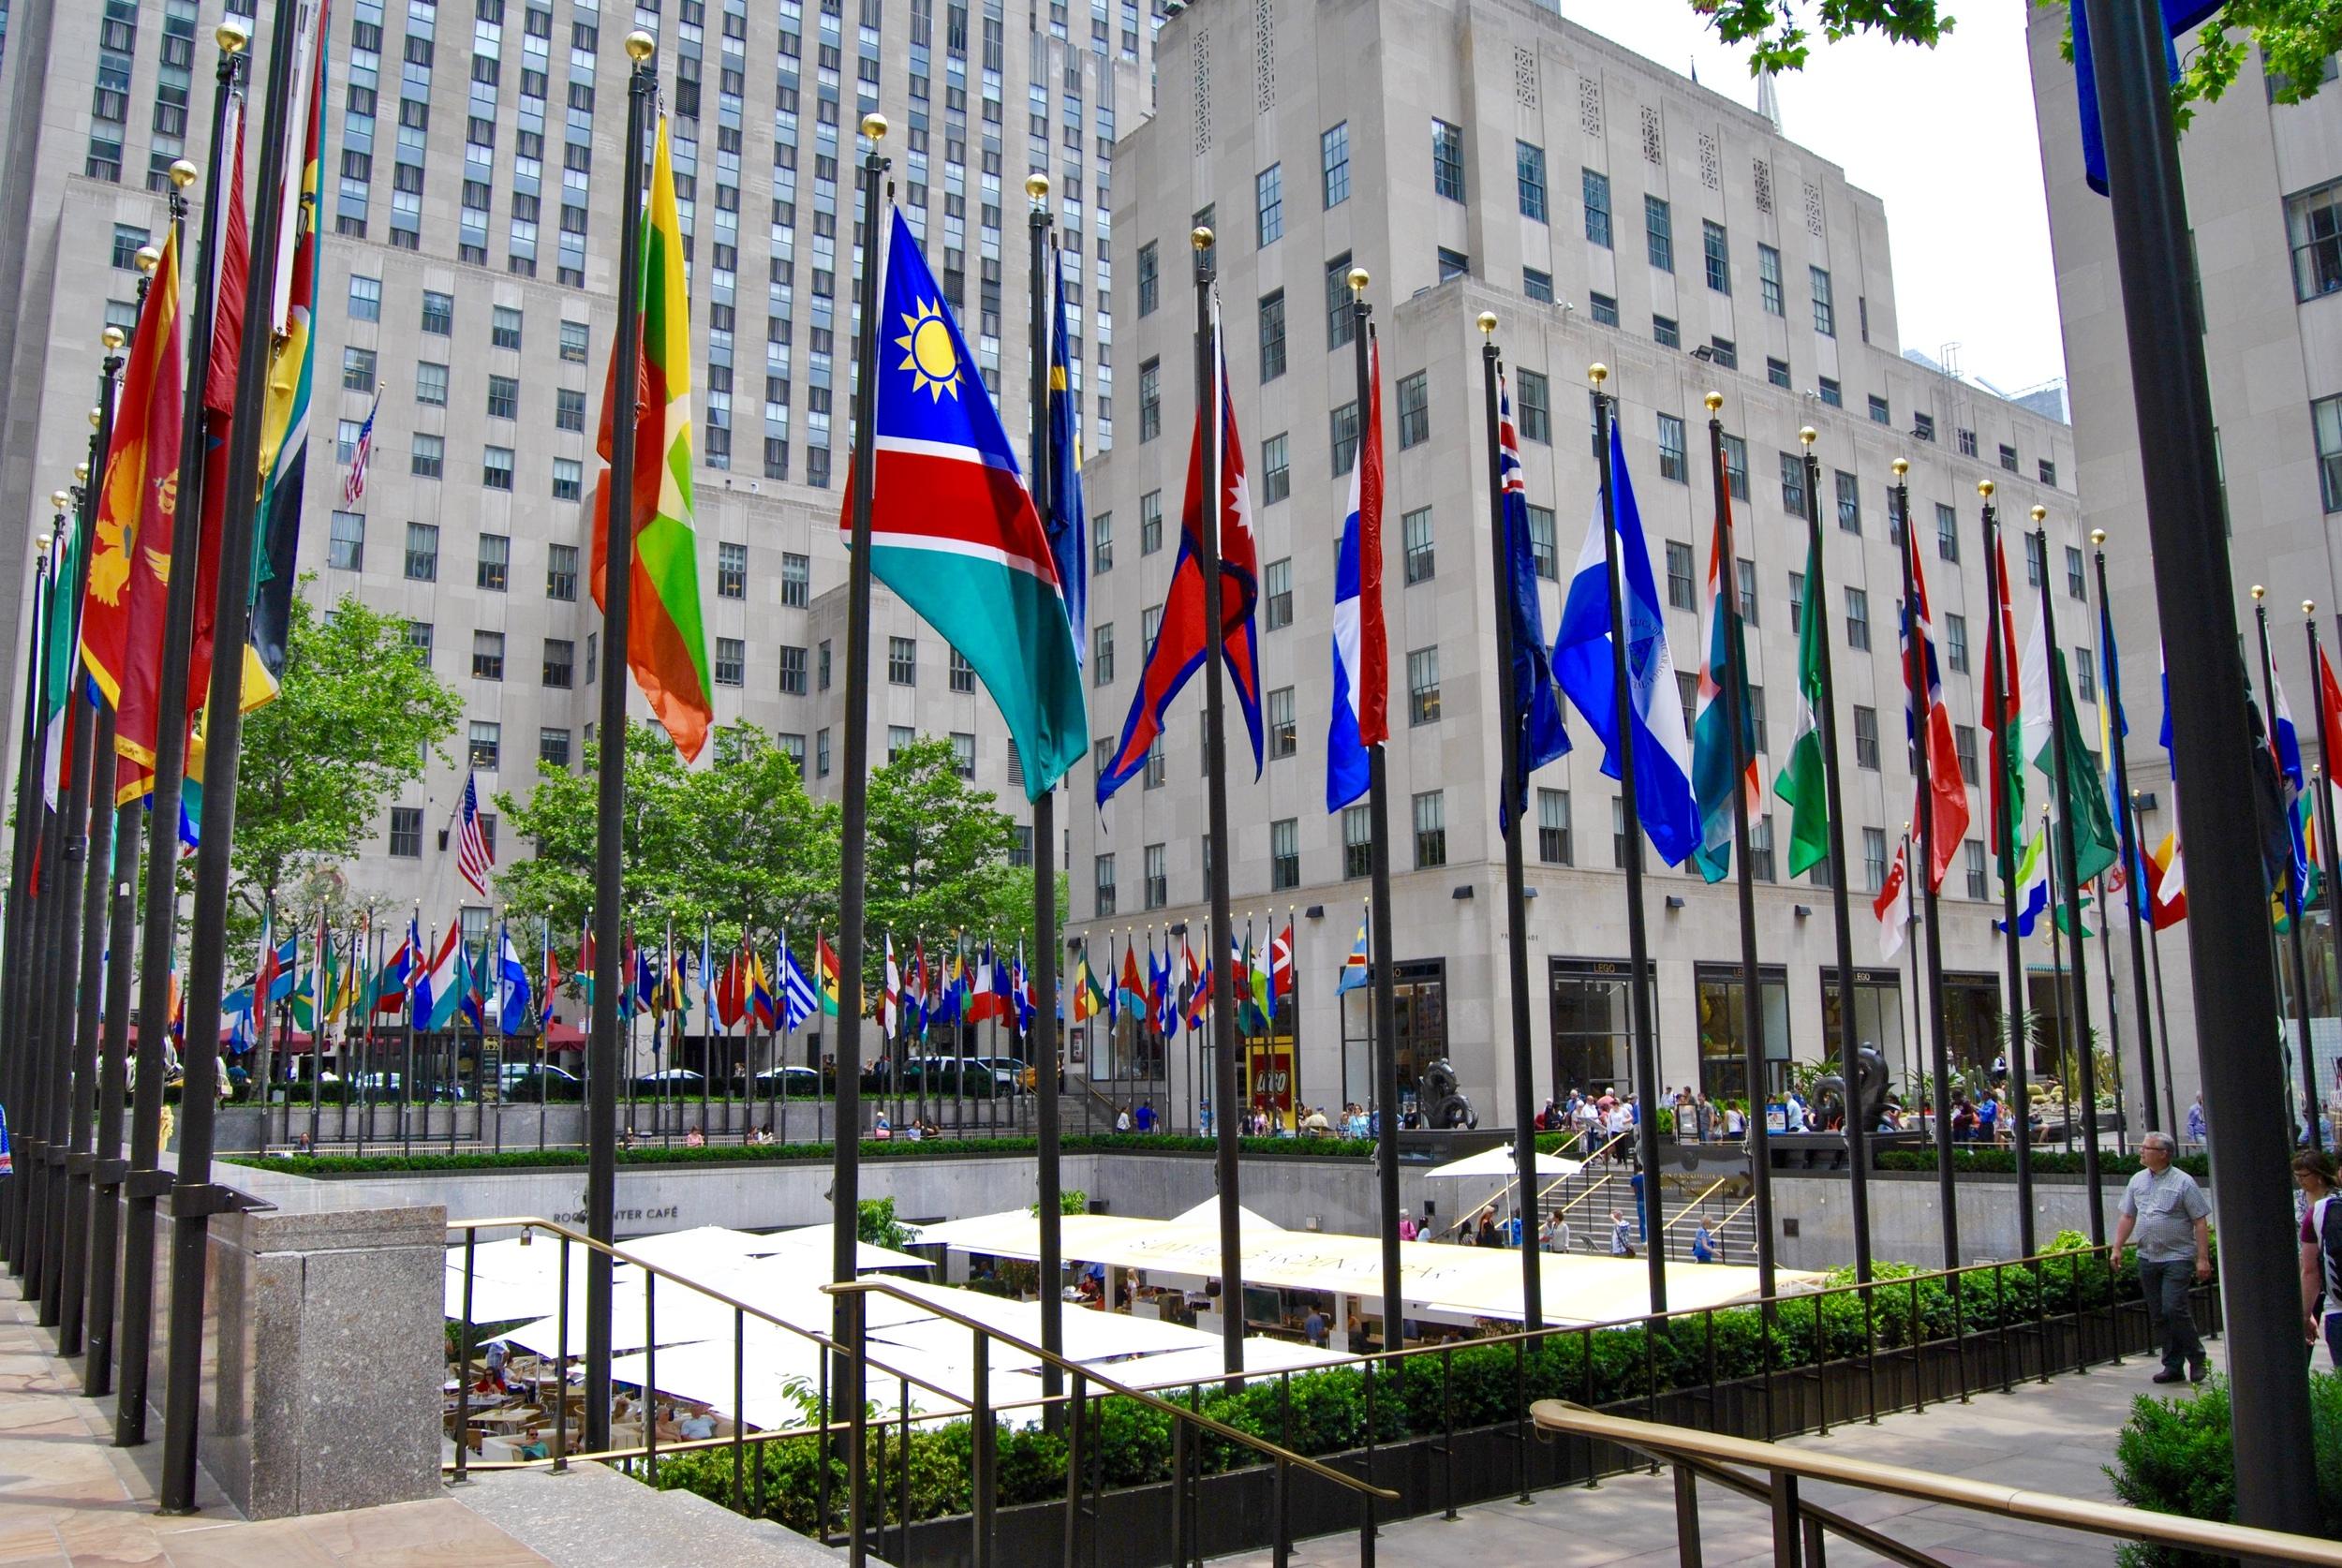 Rockefeller Plaza Flags